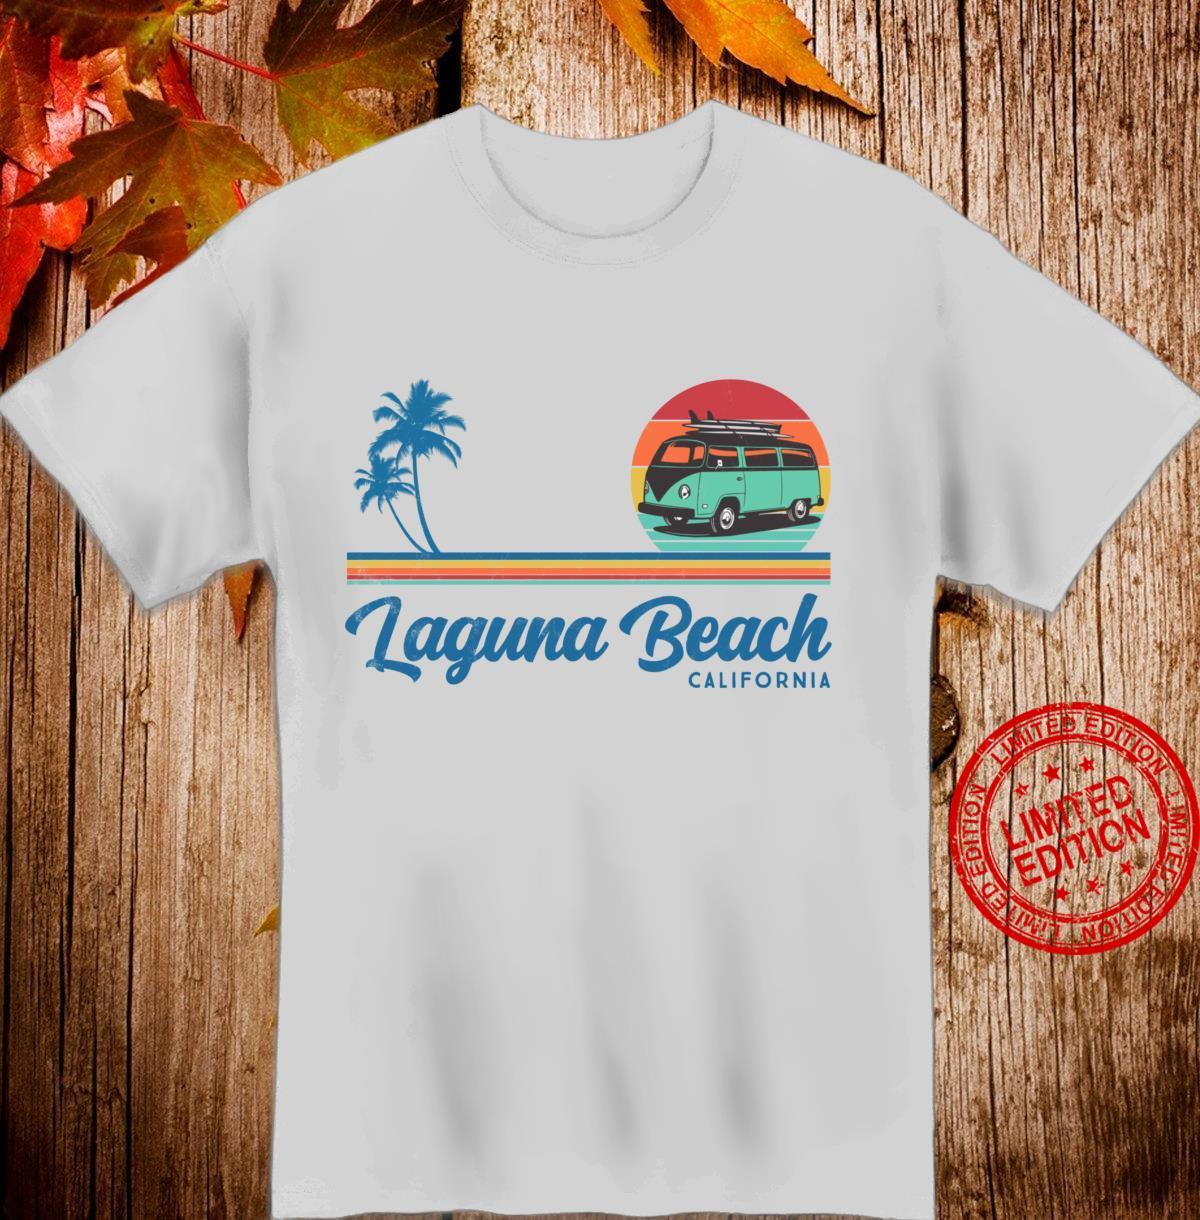 Laguna Beach California Retro Surfer Vintage van Surf Shirt